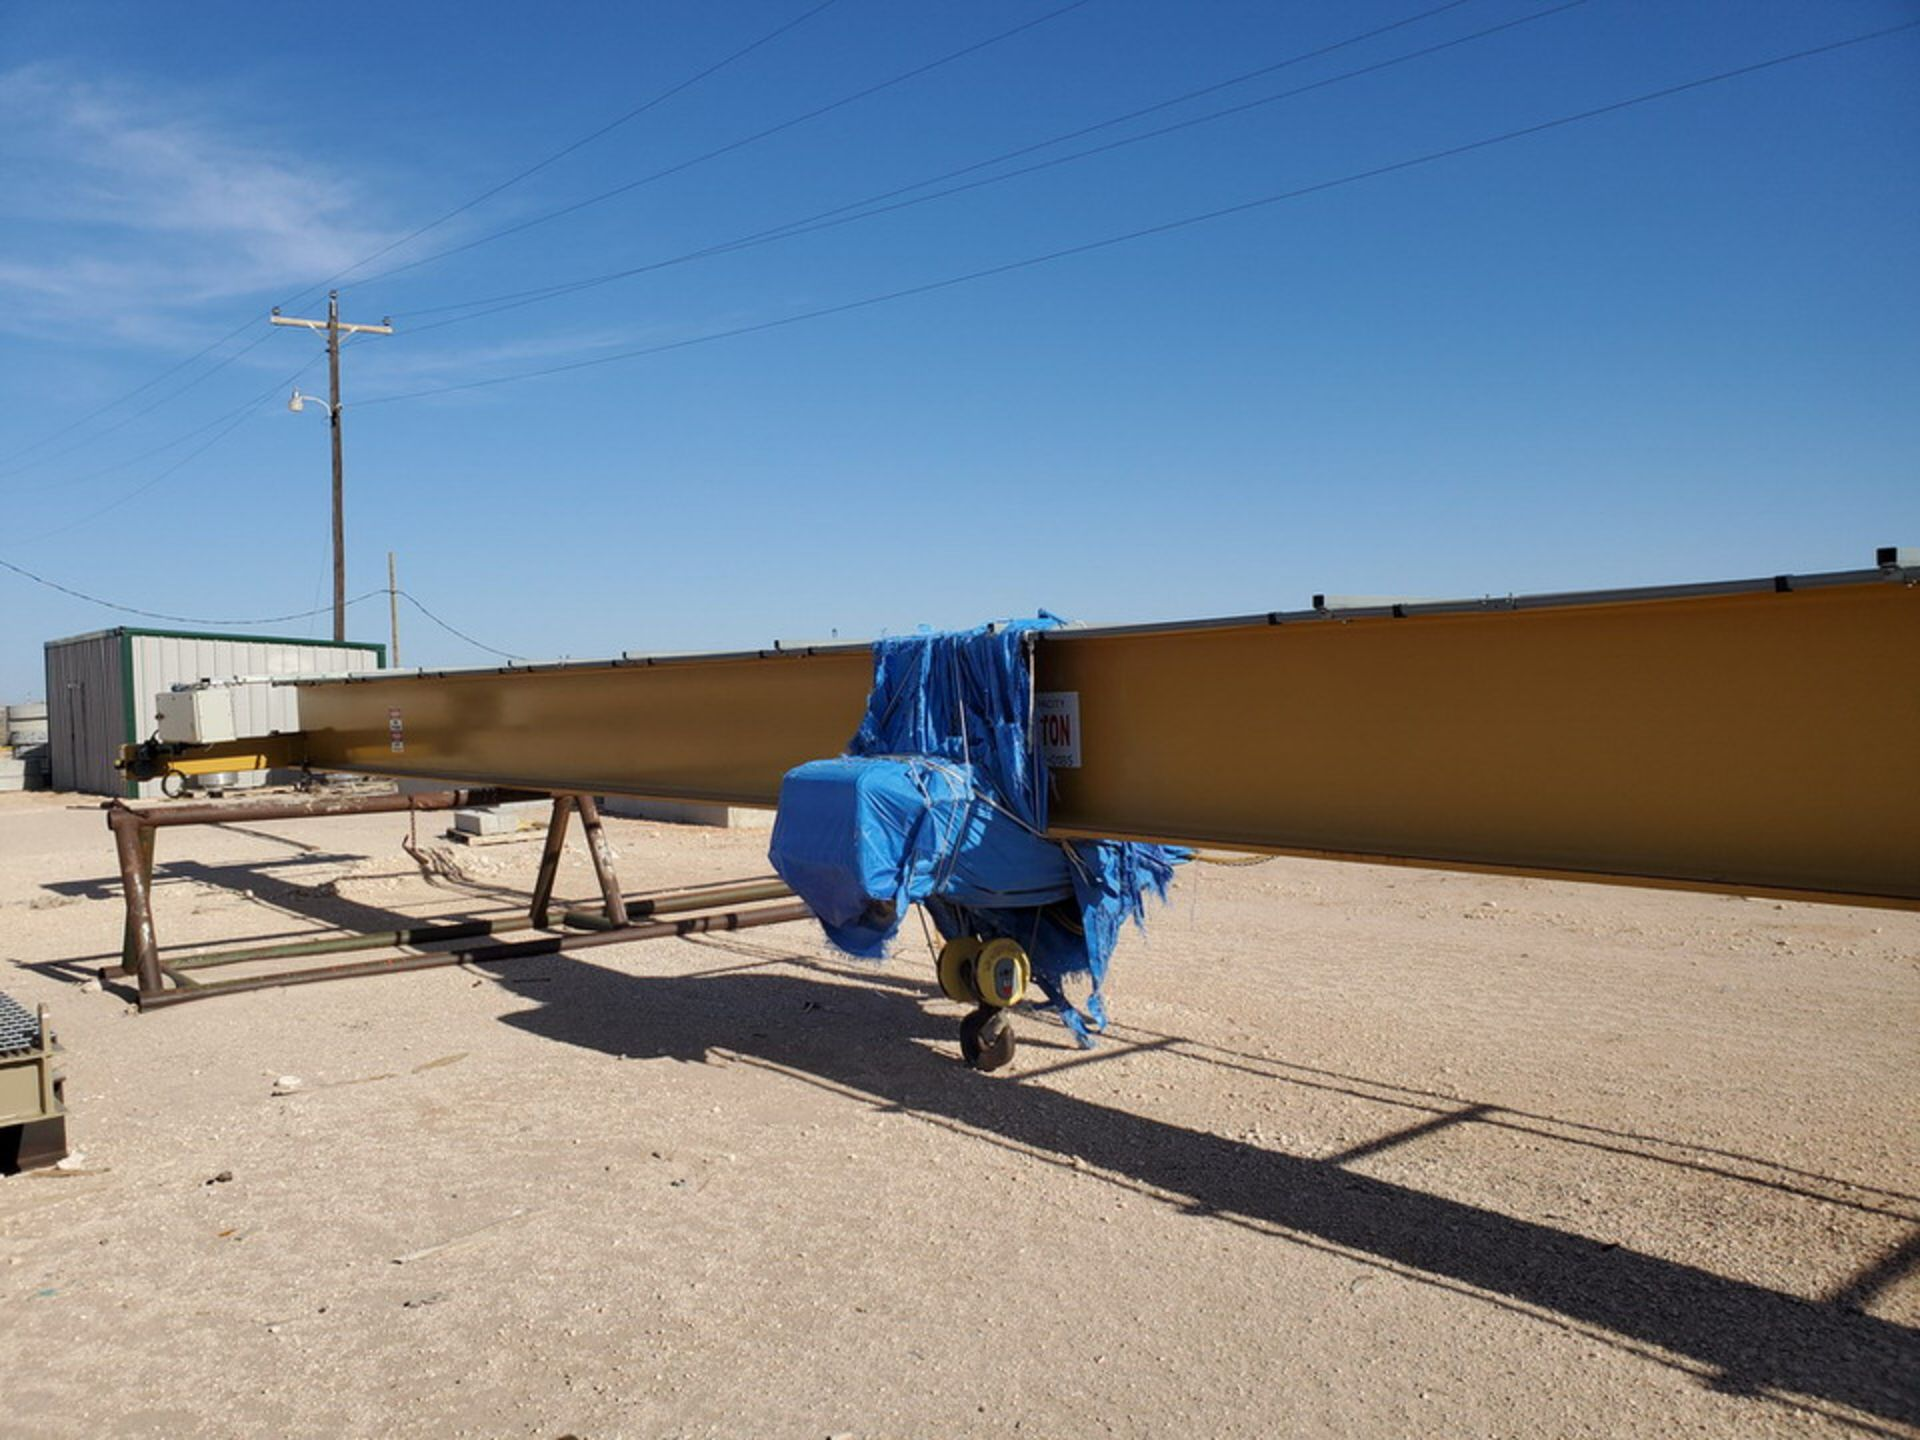 R & M 10 Ton Top Riding Bridge Crane Approx. 66' x 10'L - Image 4 of 39